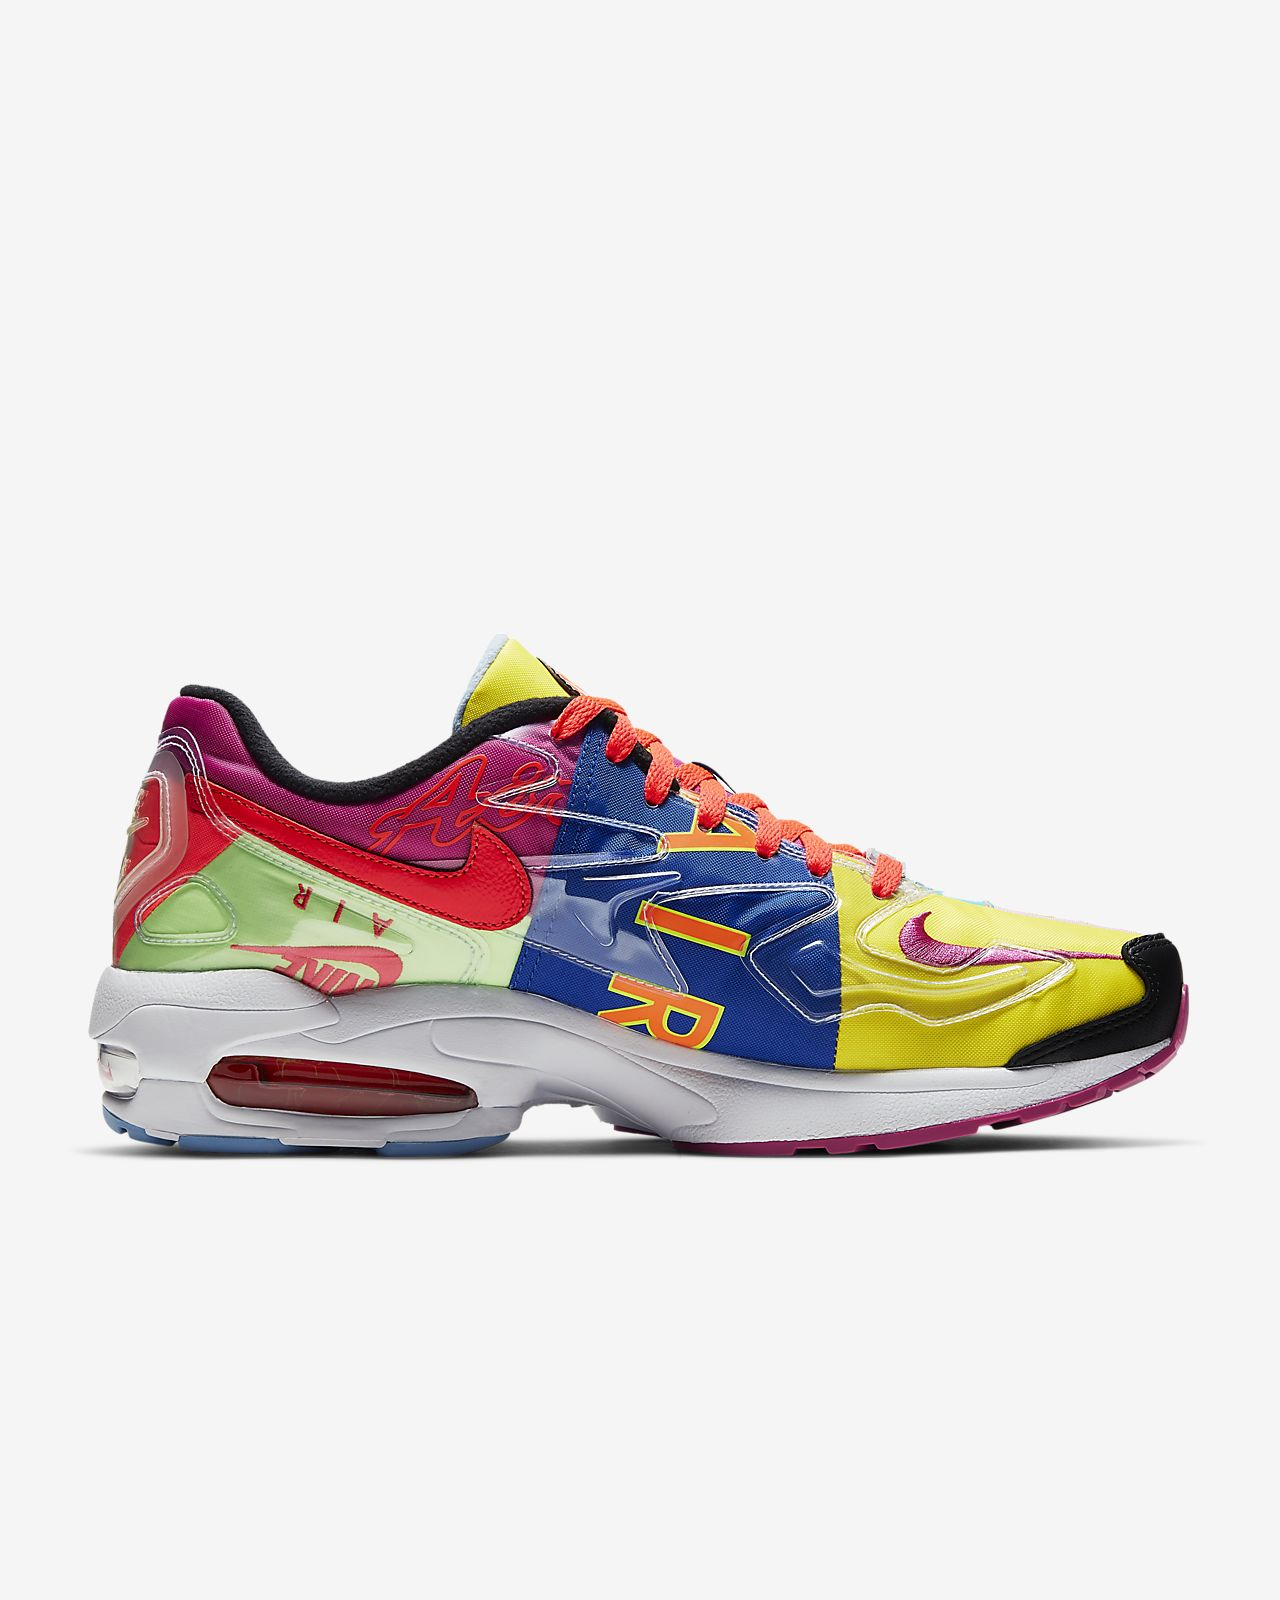 9a34e7be0b2 Nike Air Max2 Light QS Men s Shoe. Nike.com IN